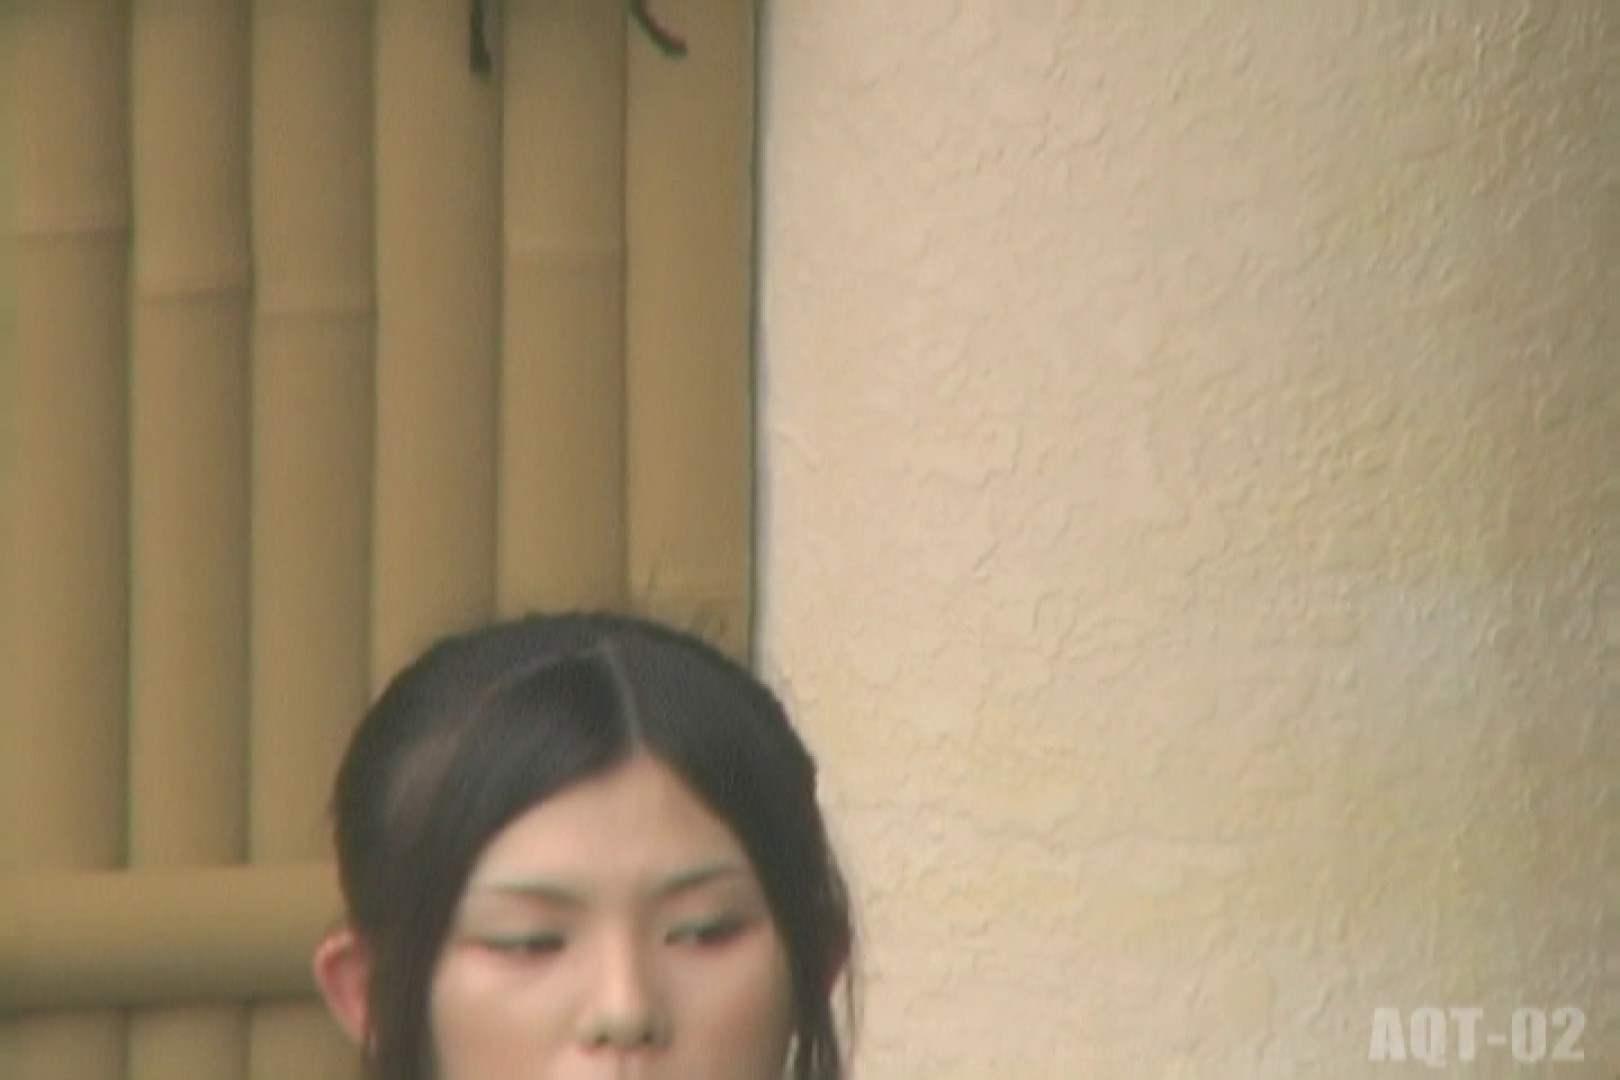 Aquaな露天風呂Vol.721 露天風呂突入 | 盗撮師作品  103pic 25